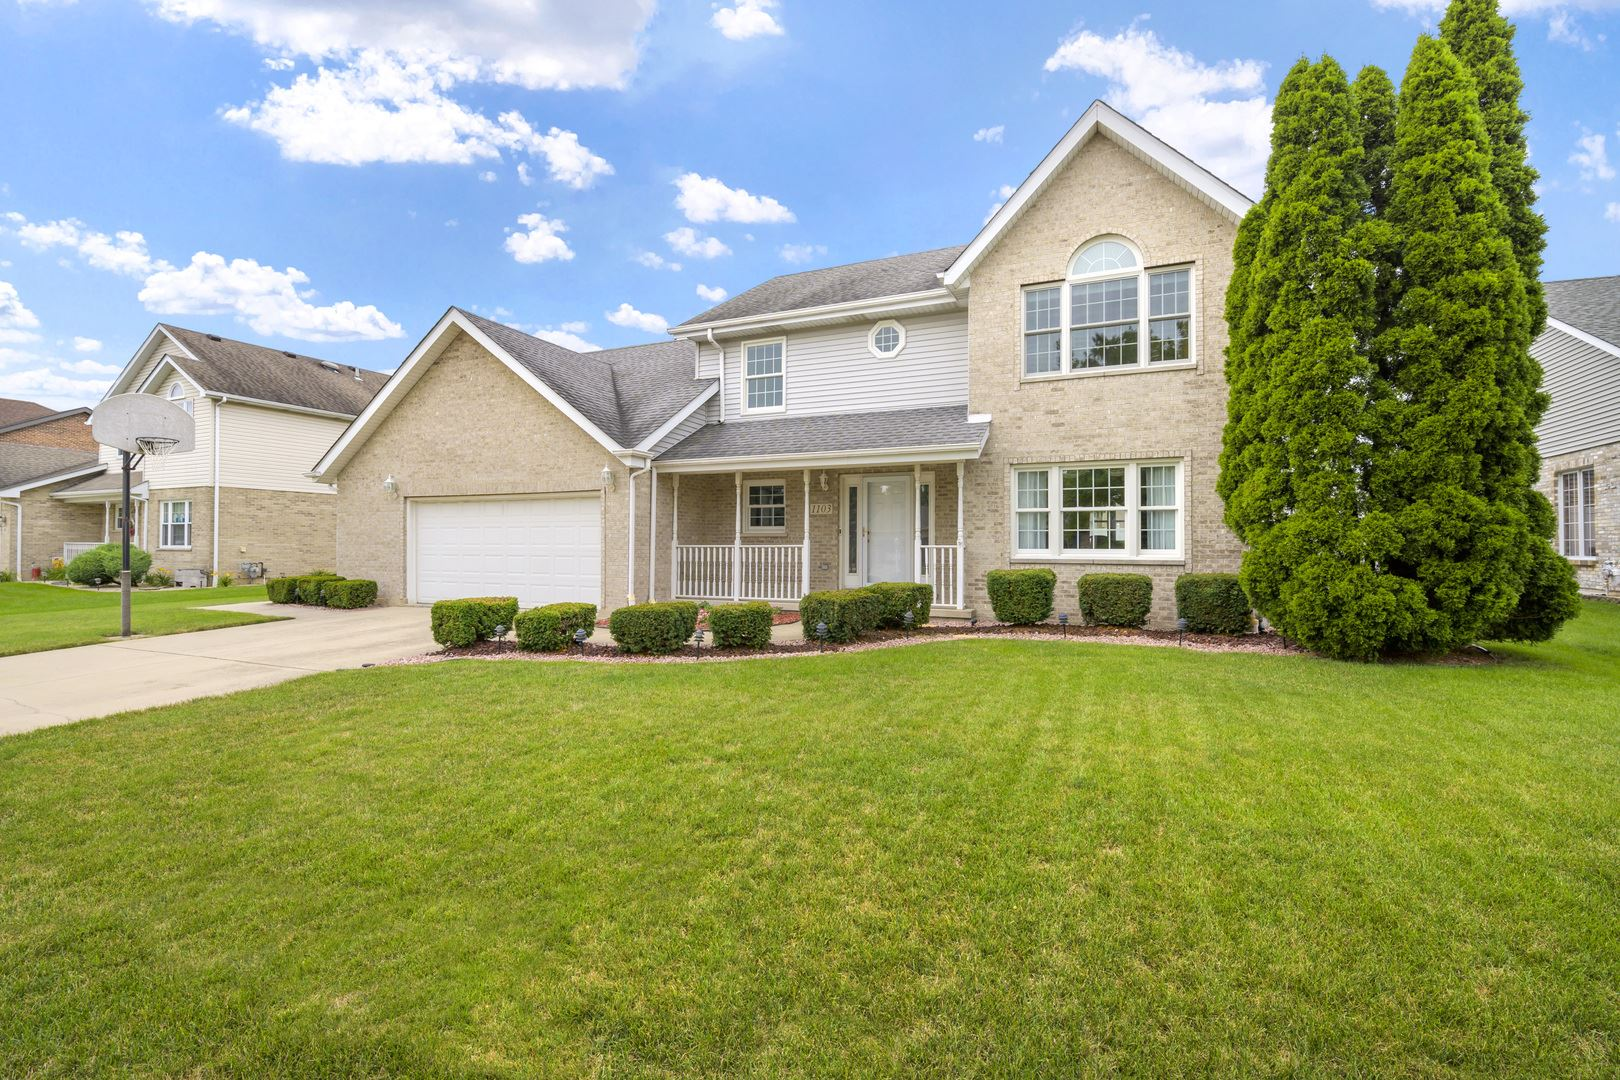 1103 Kerry Lane, Joliet, IL 60431 - #: 10807602